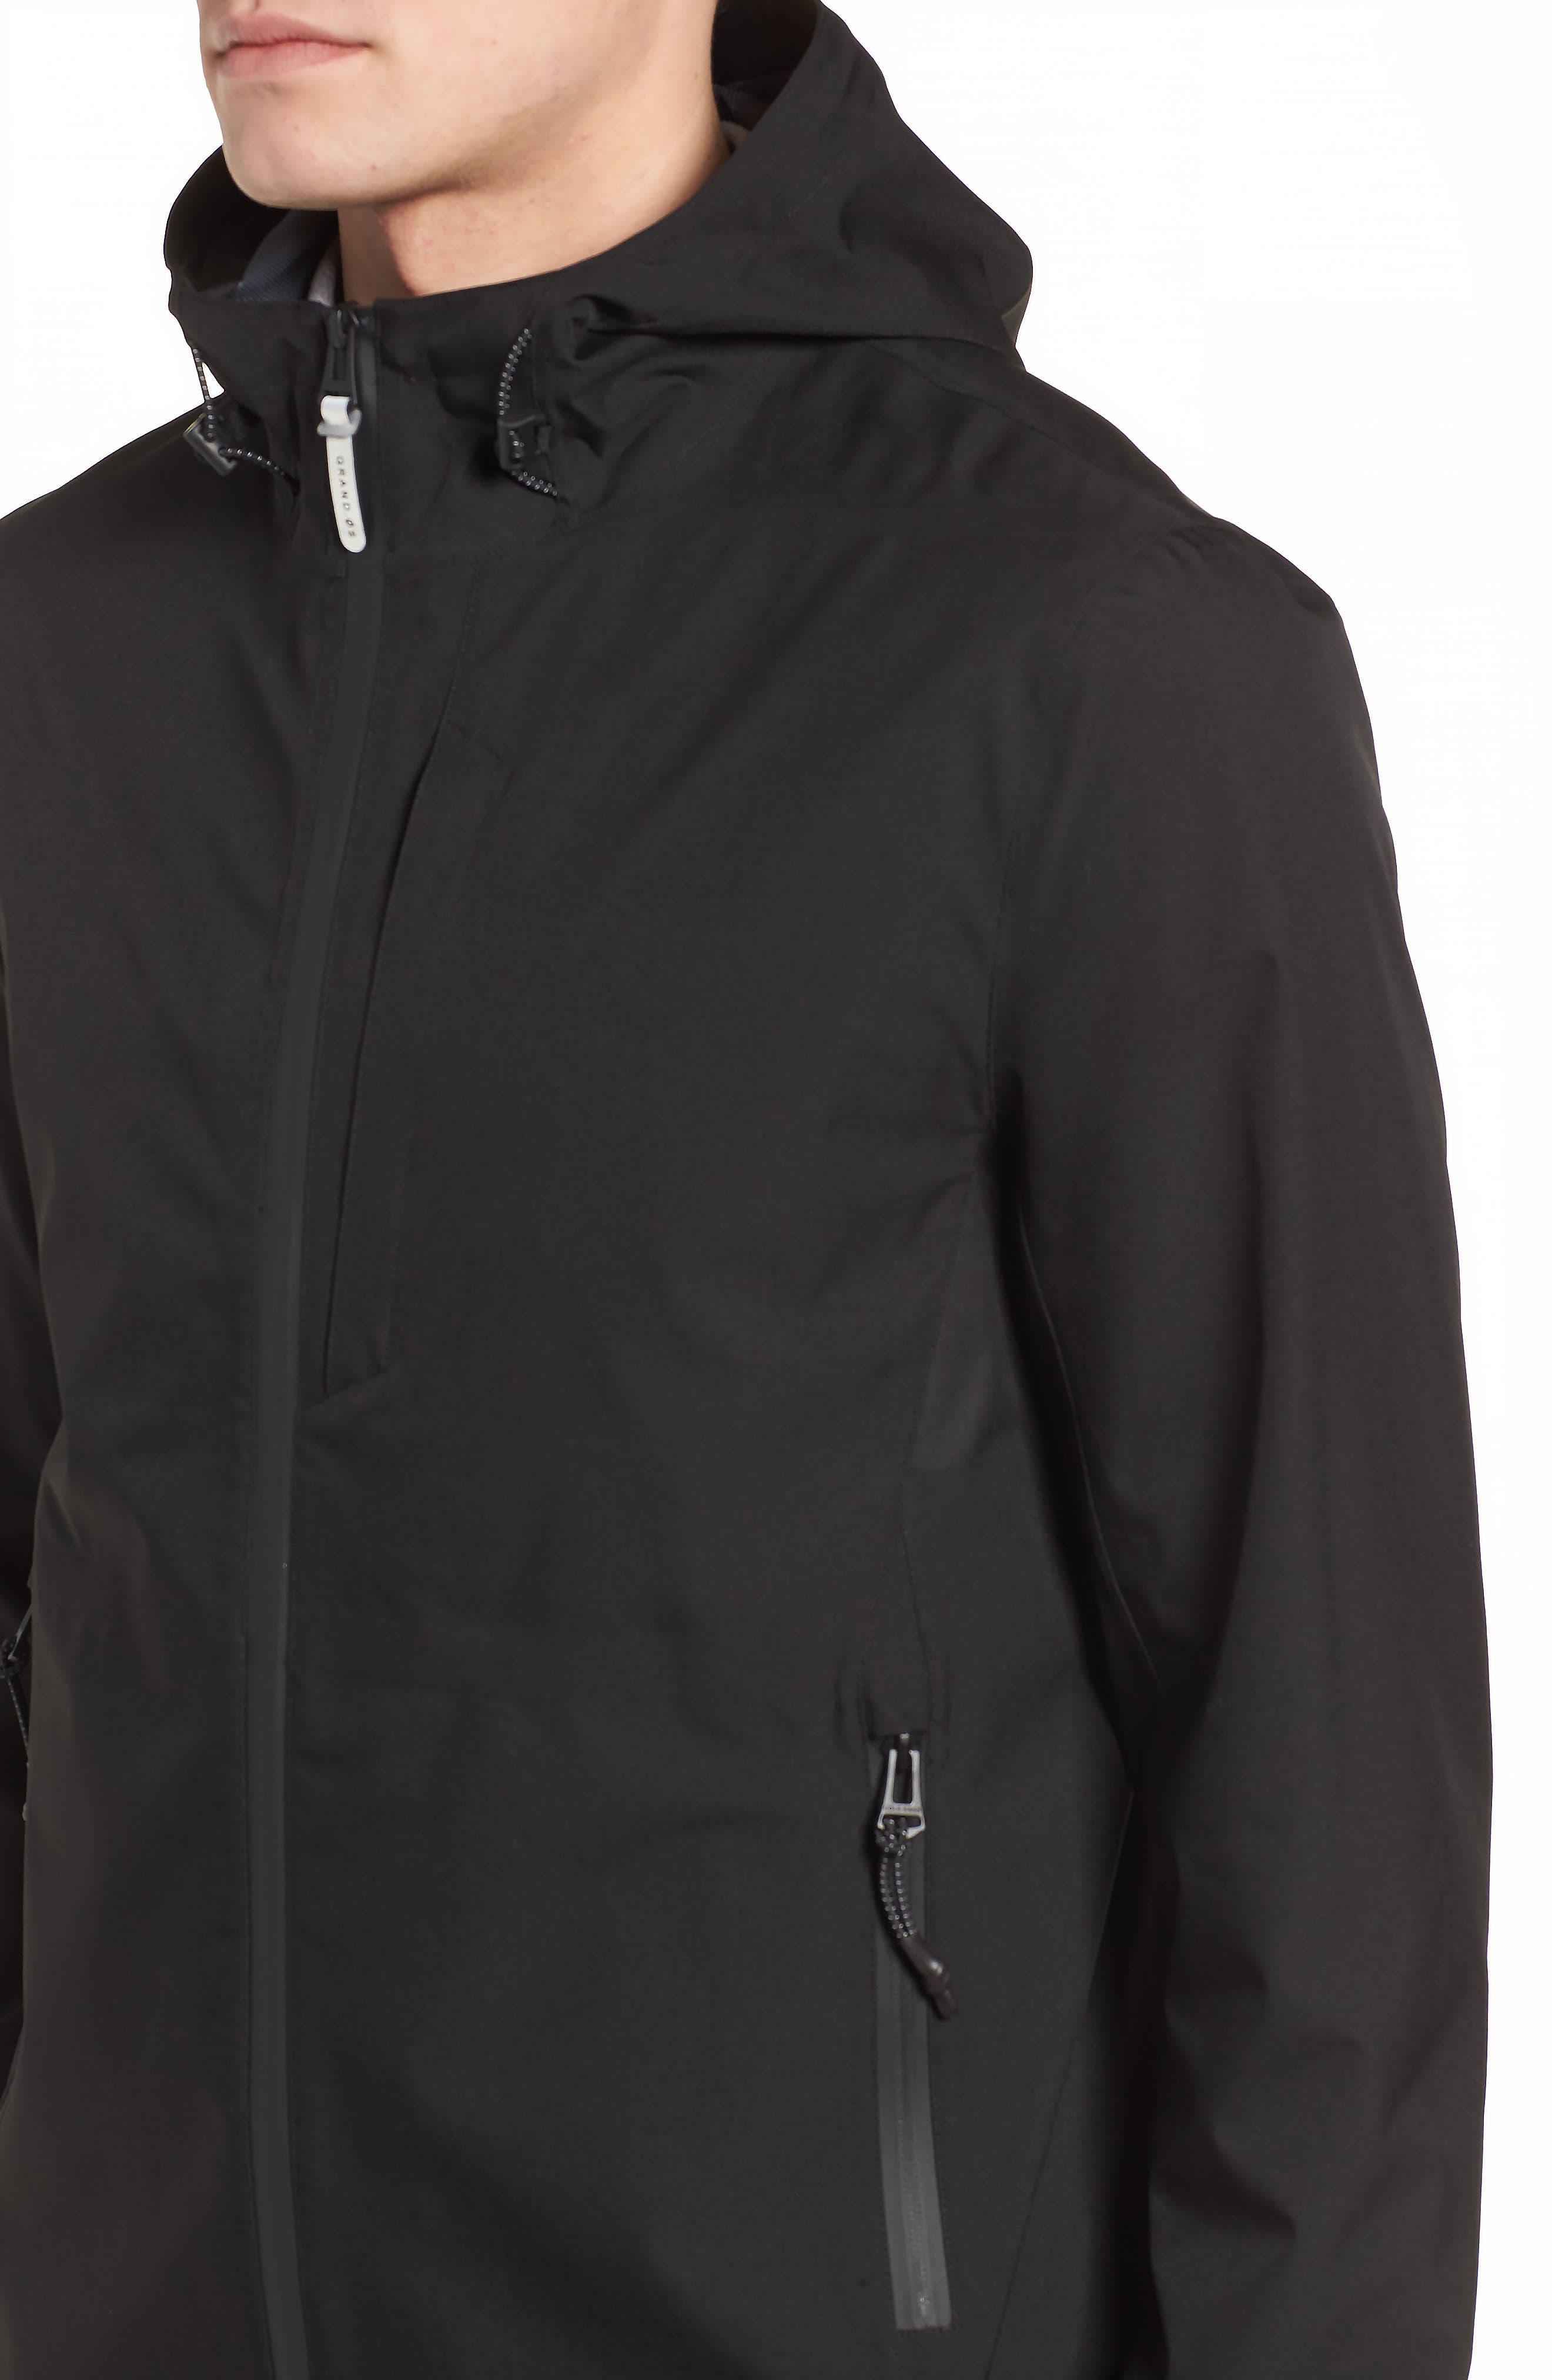 Seam Sealed Packable Jacket,                             Alternate thumbnail 4, color,                             Black